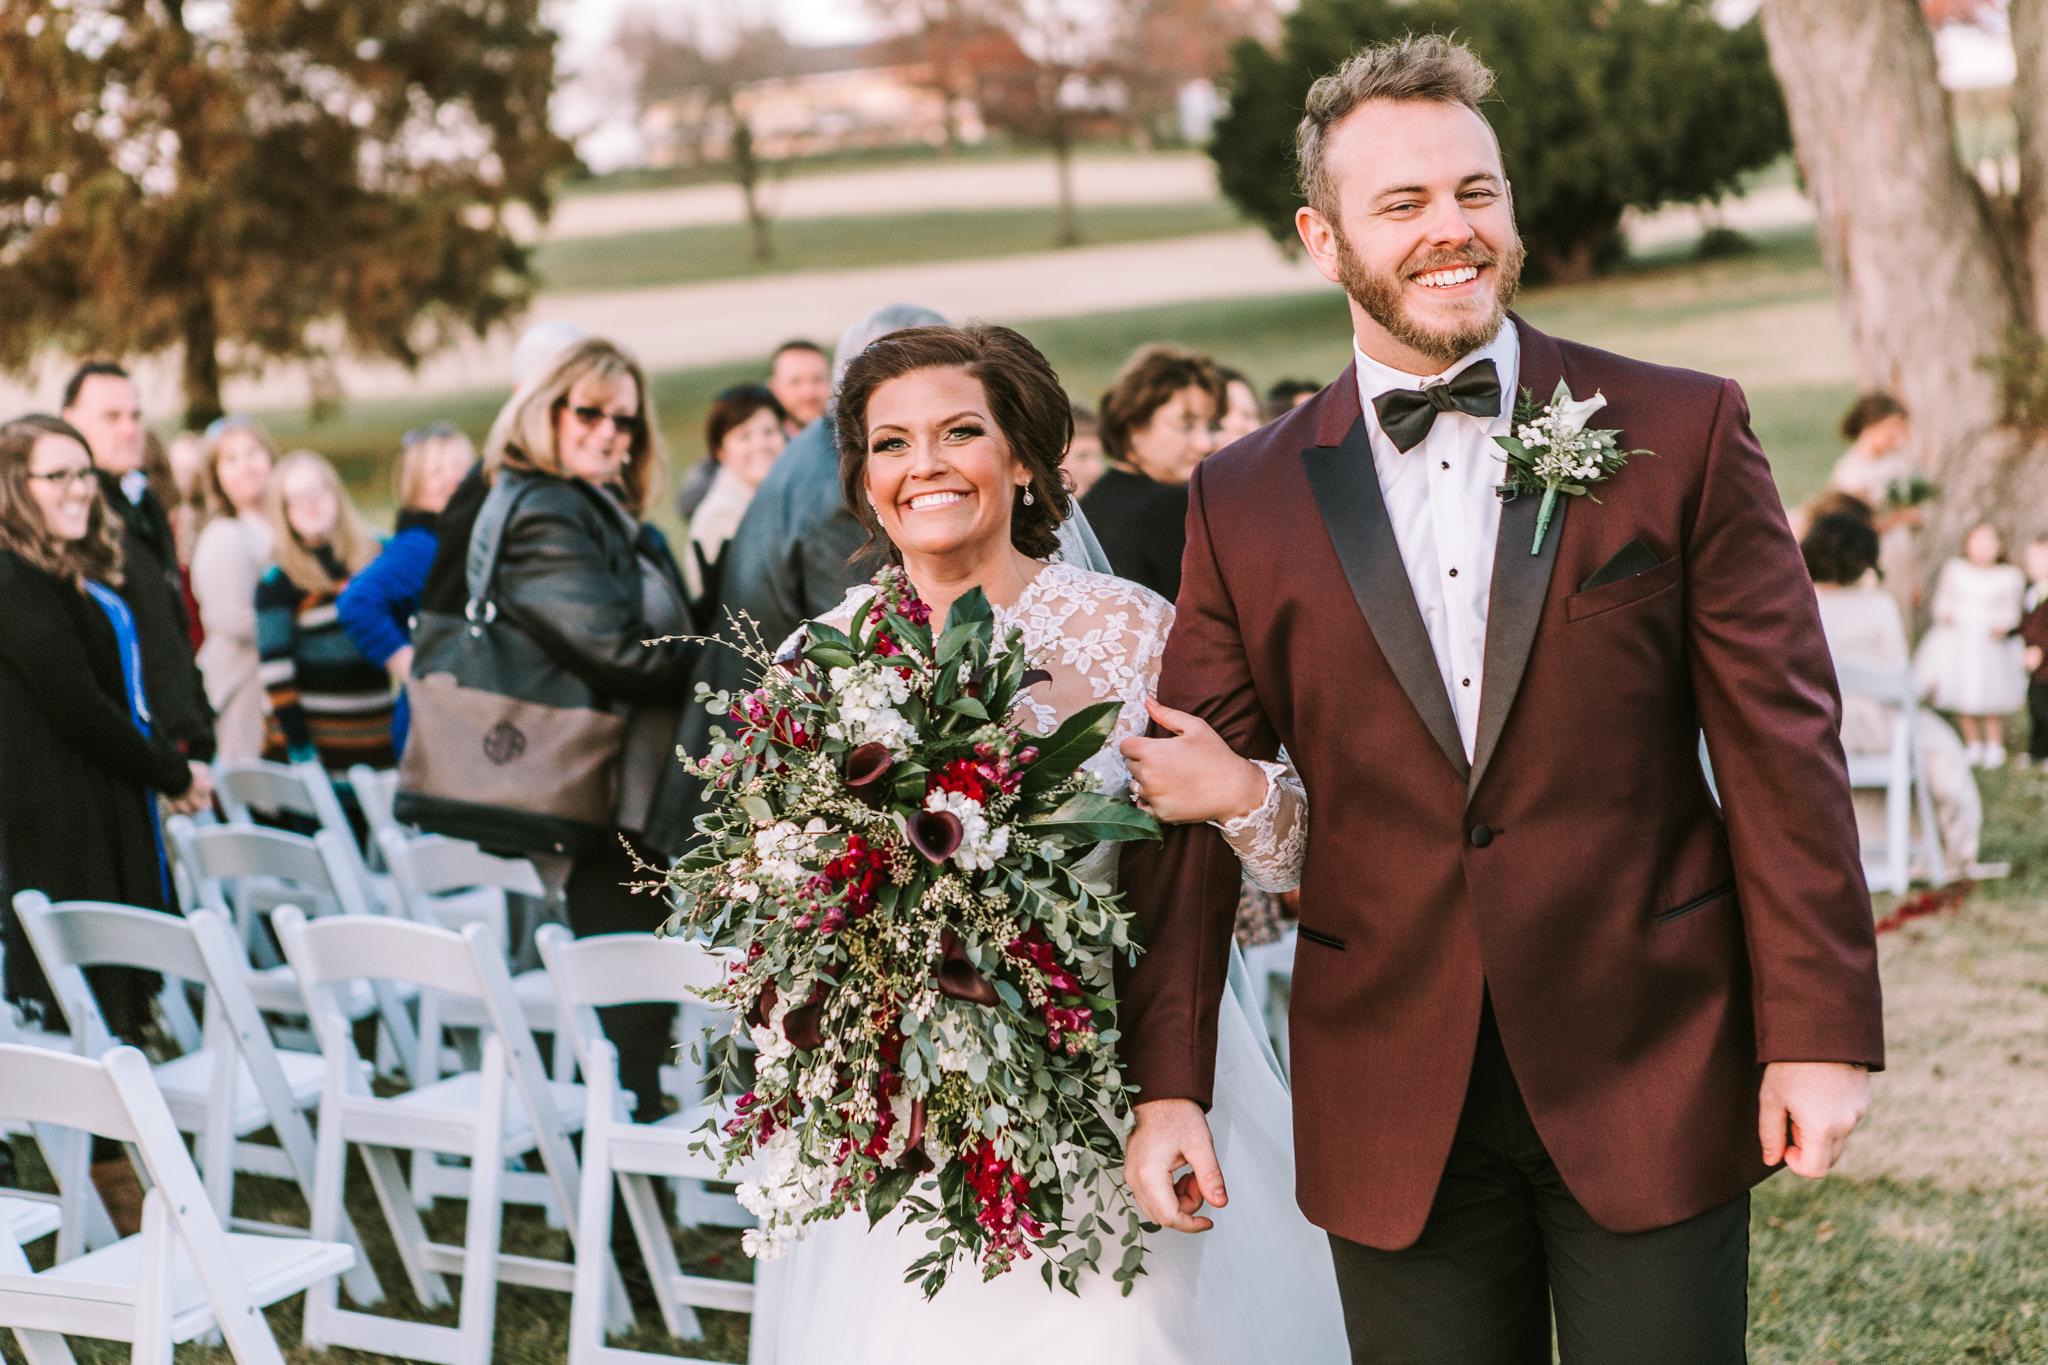 Richmond Kentucky Wedding Photographer - Ariana Jordan Photography -25.jpg